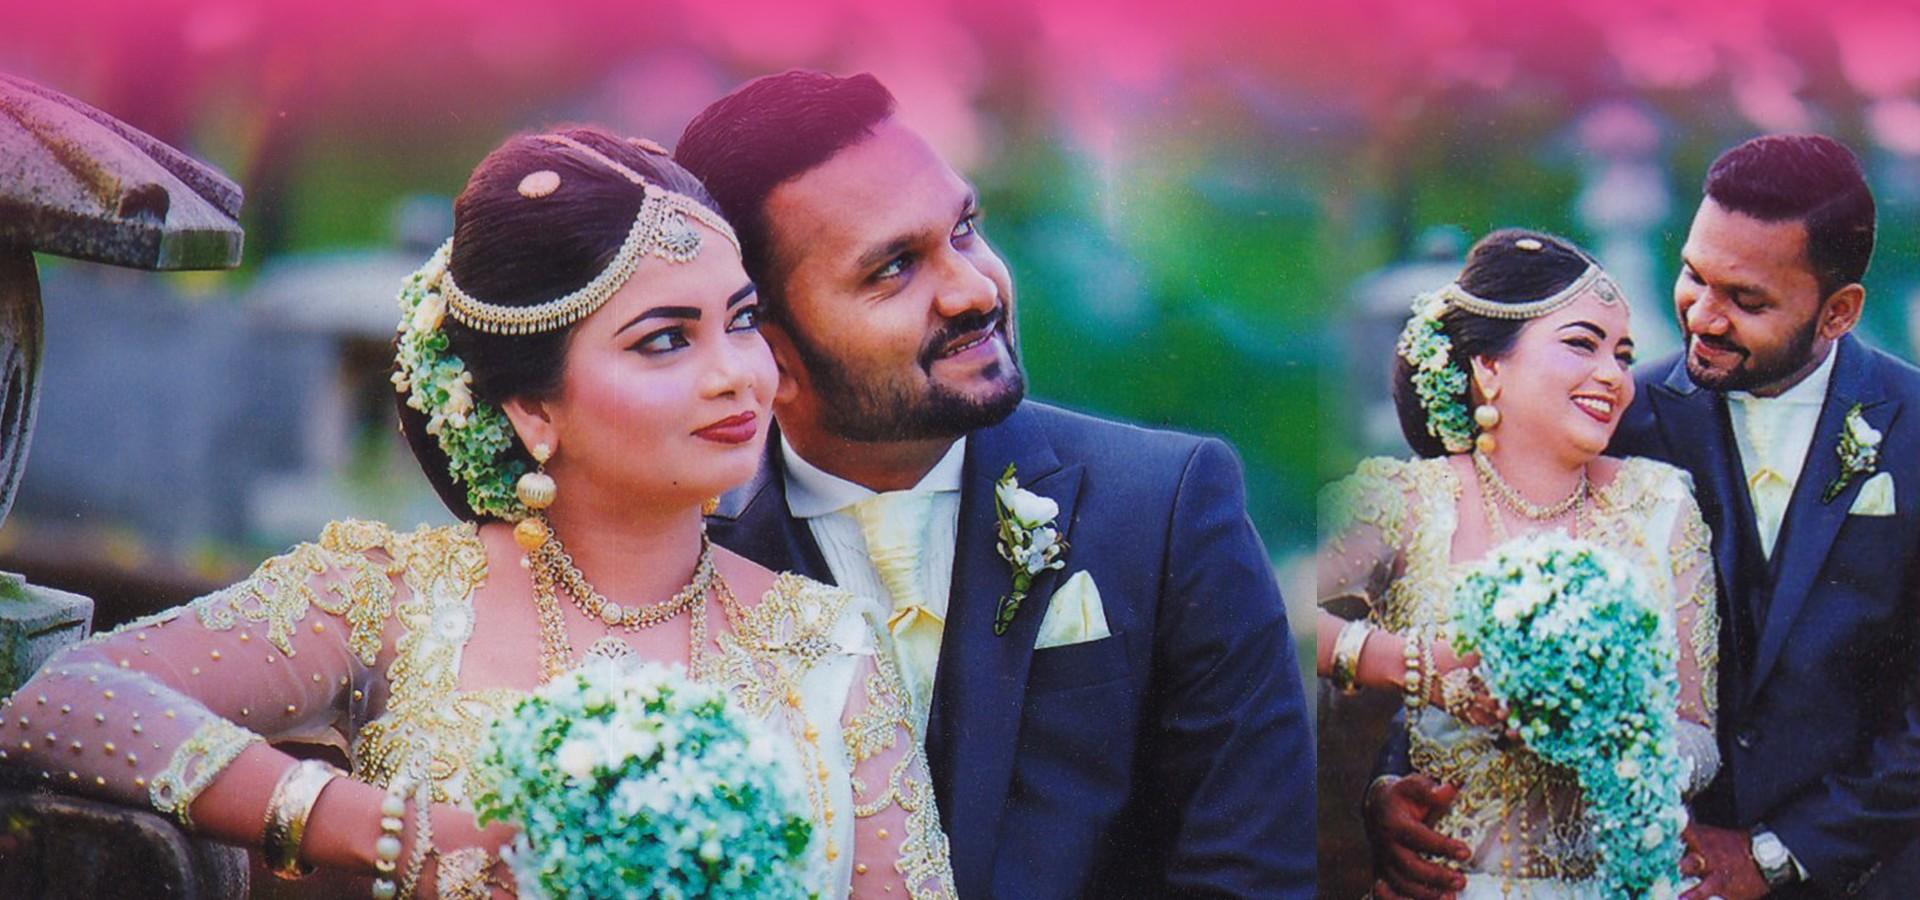 Sri Lanka Marriage Proposals | Isurulanka